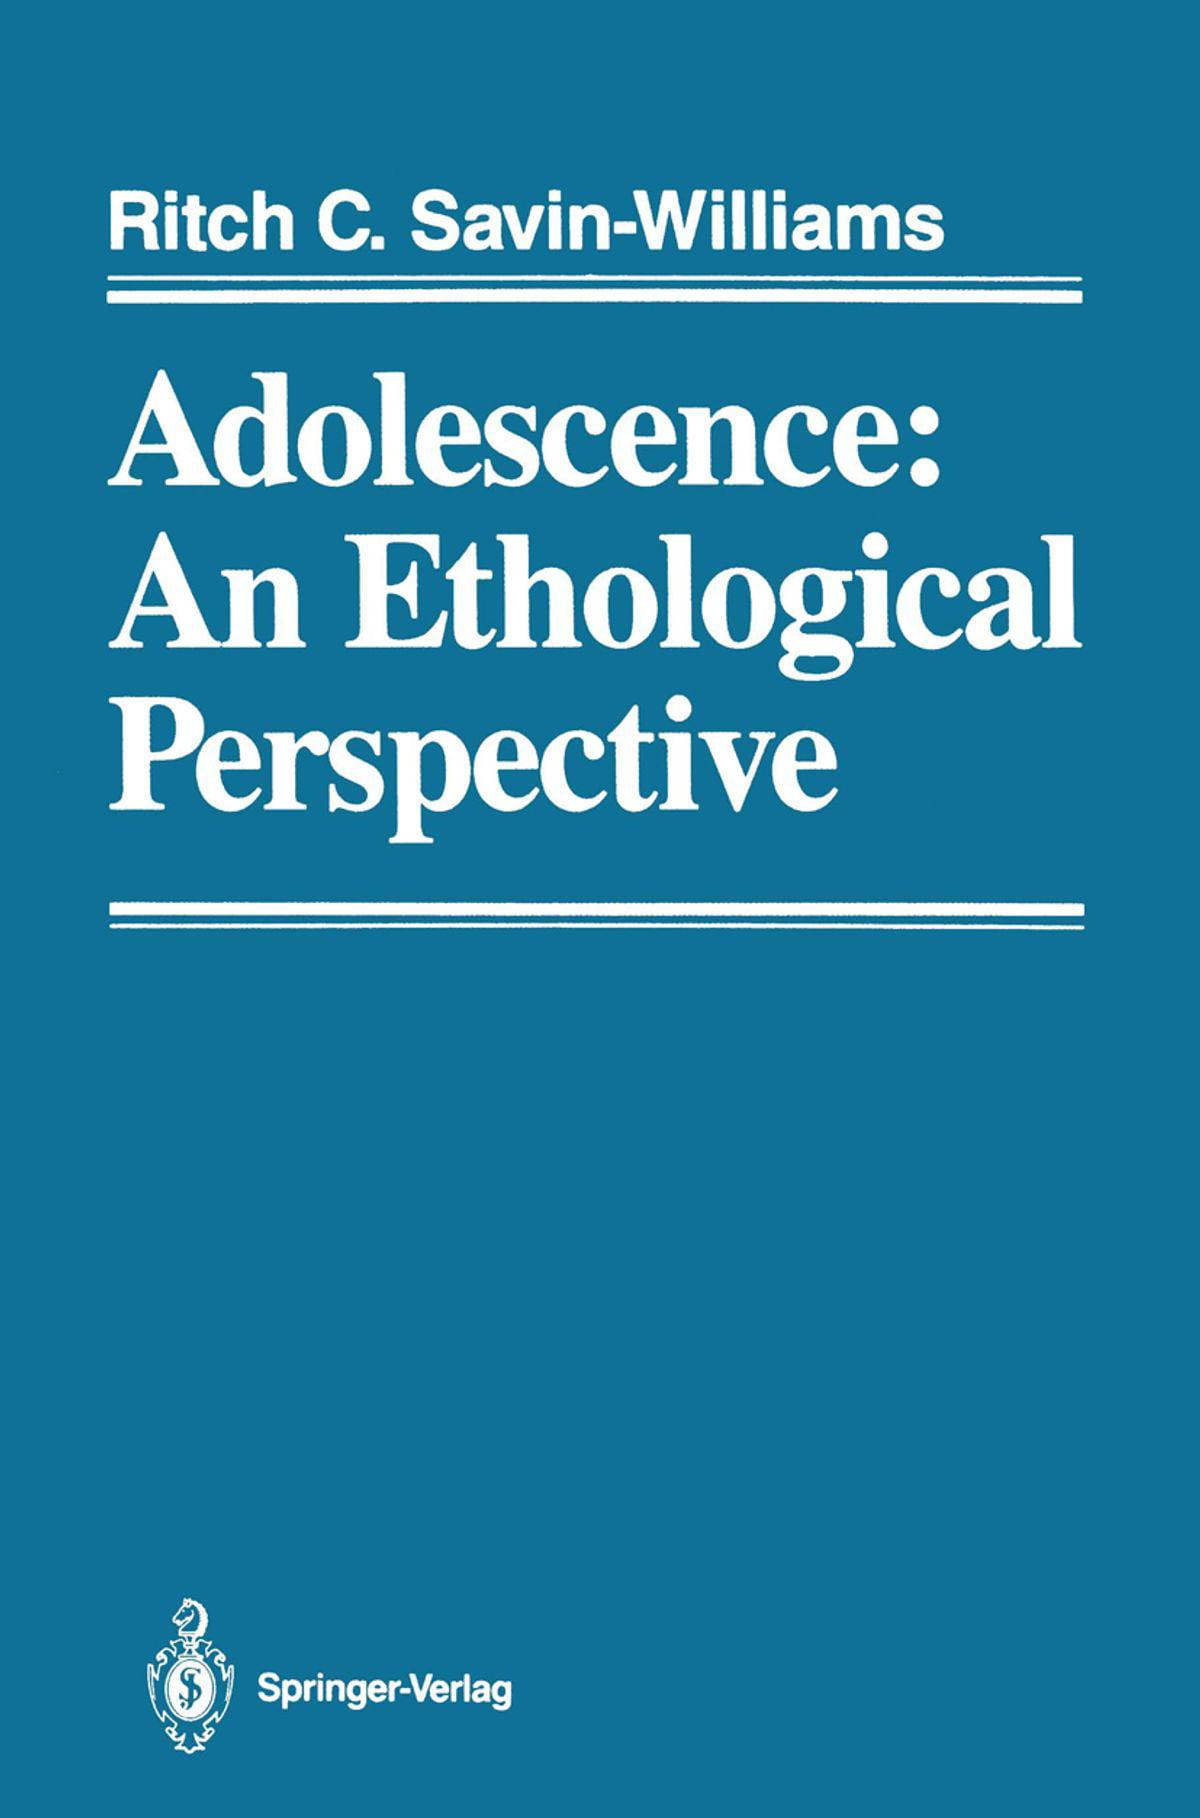 Adolescence: An Ethological Perspective - eBook - Walmart